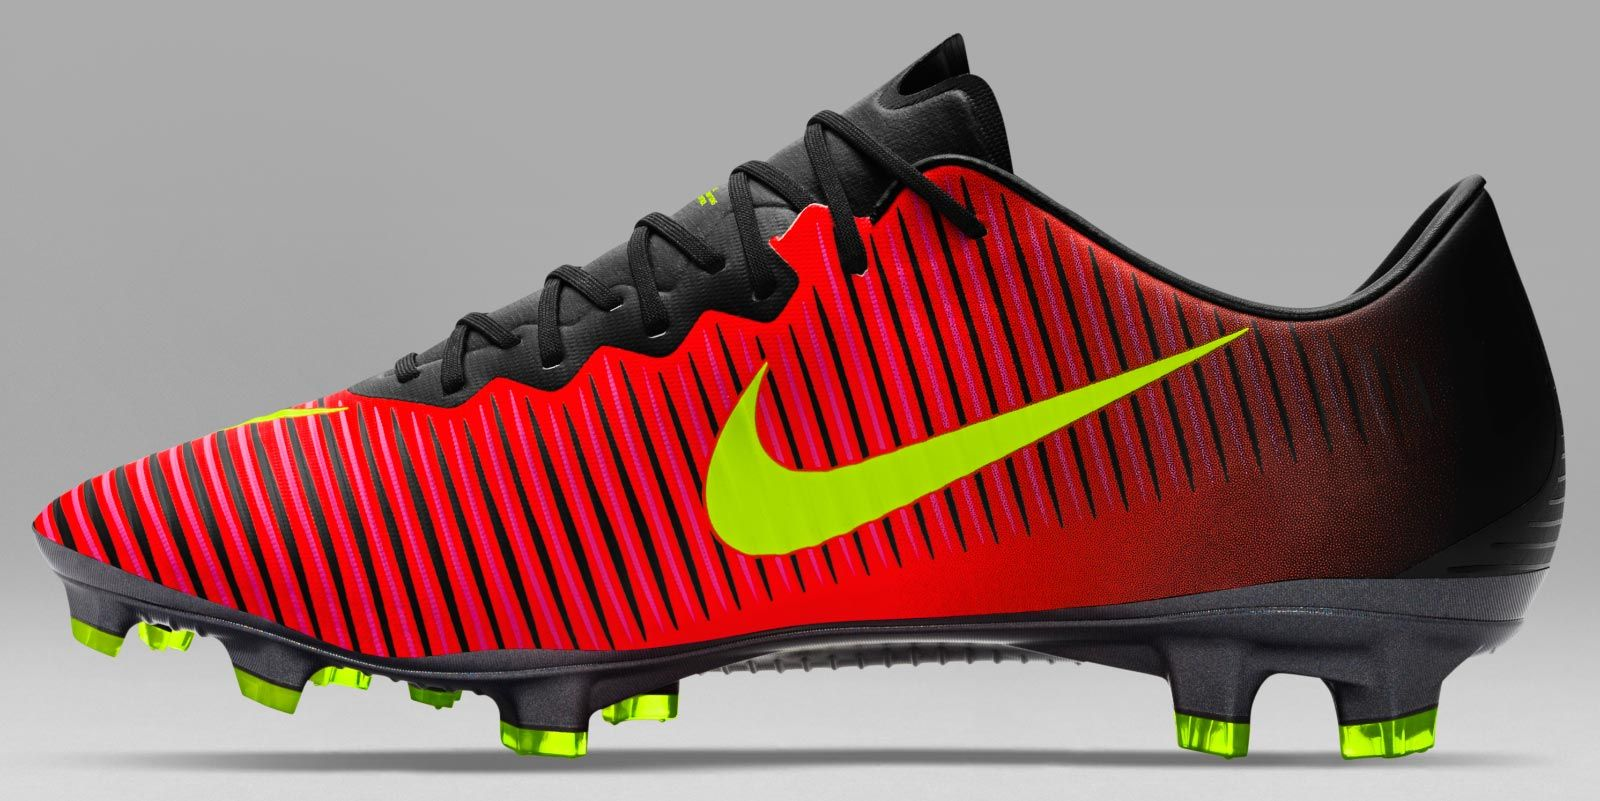 sale retailer f223f 0298e ... The next-gen Nike Mercurial Vapor XI 2016 boots introduce a bold  design, ...